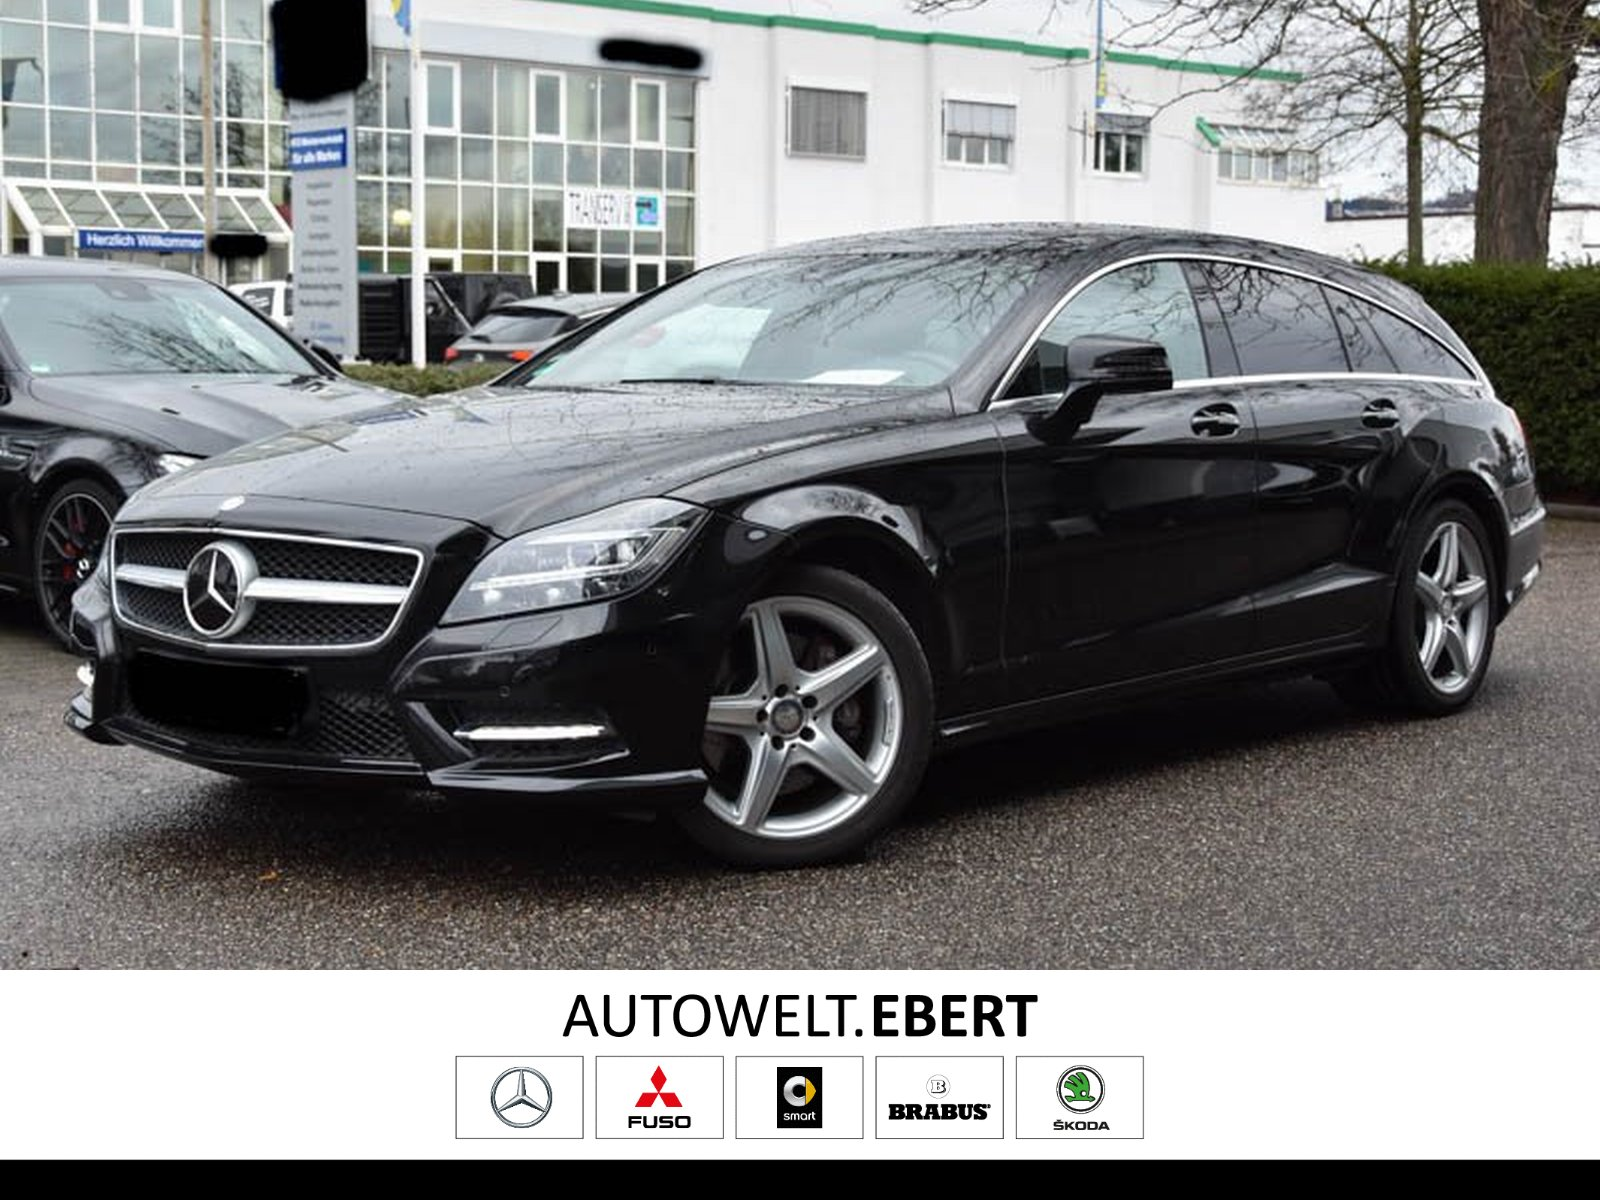 Mercedes-Benz CLS 350 CDI SB AMG COMAND+LED+RFK+BURM+DISTRONIC, Jahr 2014, Diesel